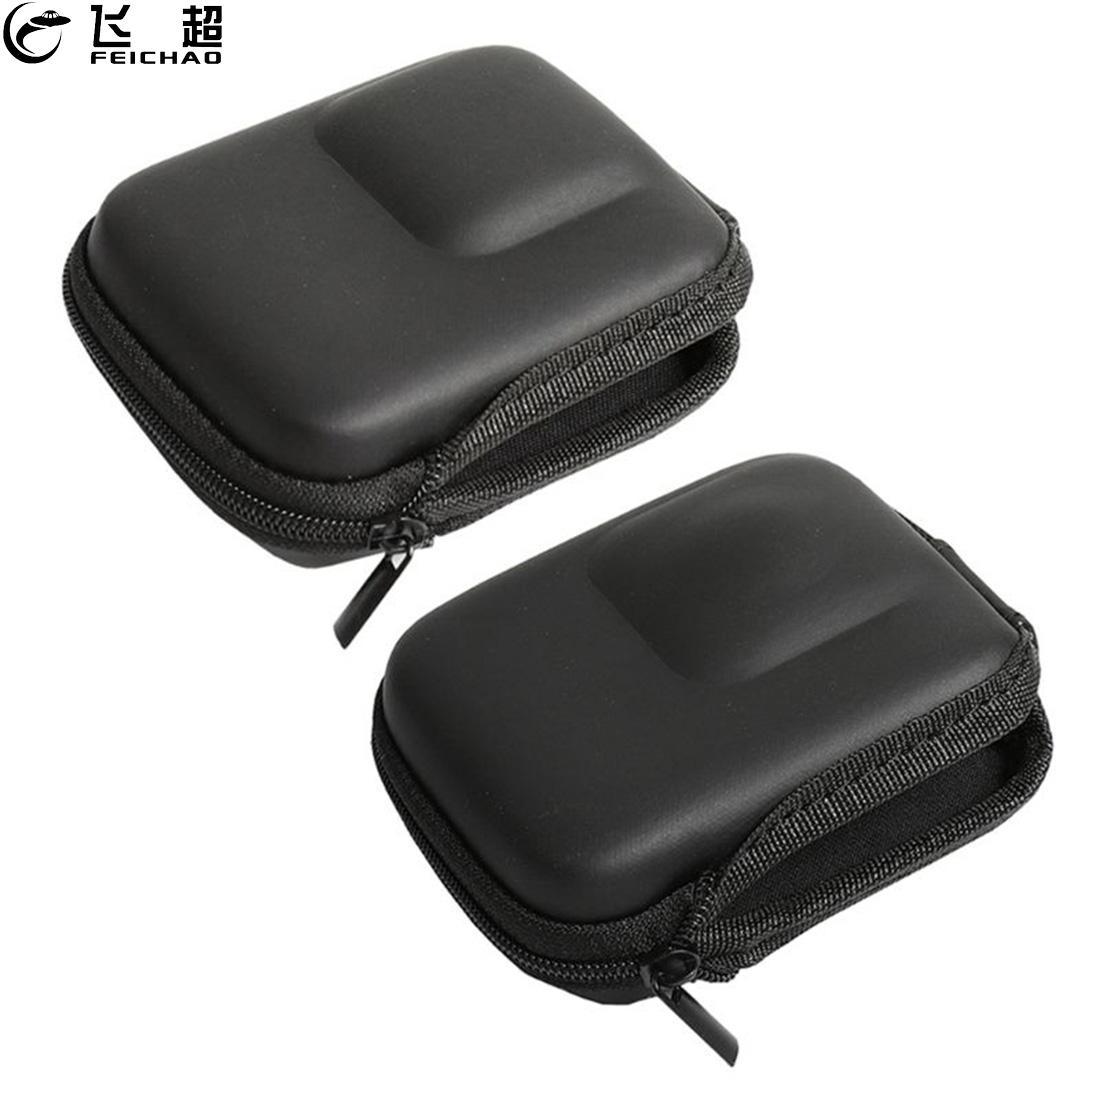 Mini bolsa de almacenamiento portátil para Insta360 ONE R 4K / Insta 360, edición panorámica, Estuche de transporte protectora de cámara, accesorios de caja de PU